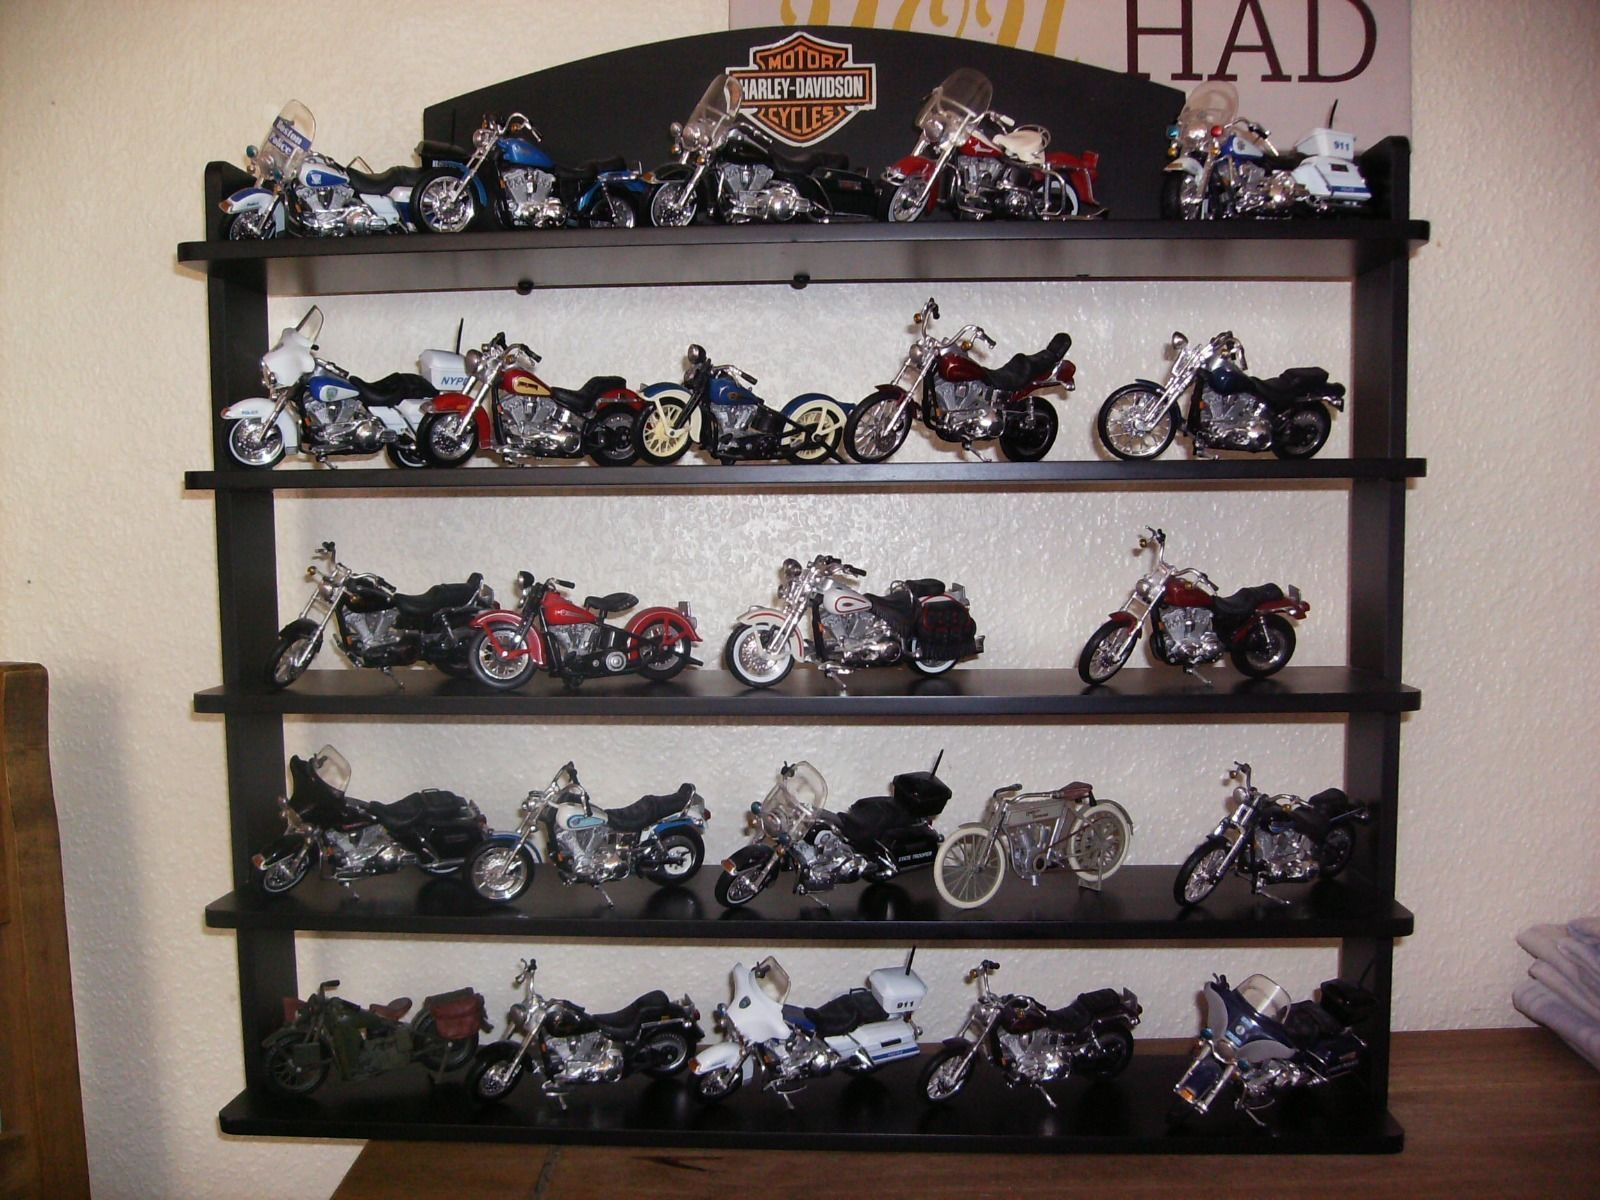 Harley Davidson collectors bikes and display shelf. ex. cond. | eBay